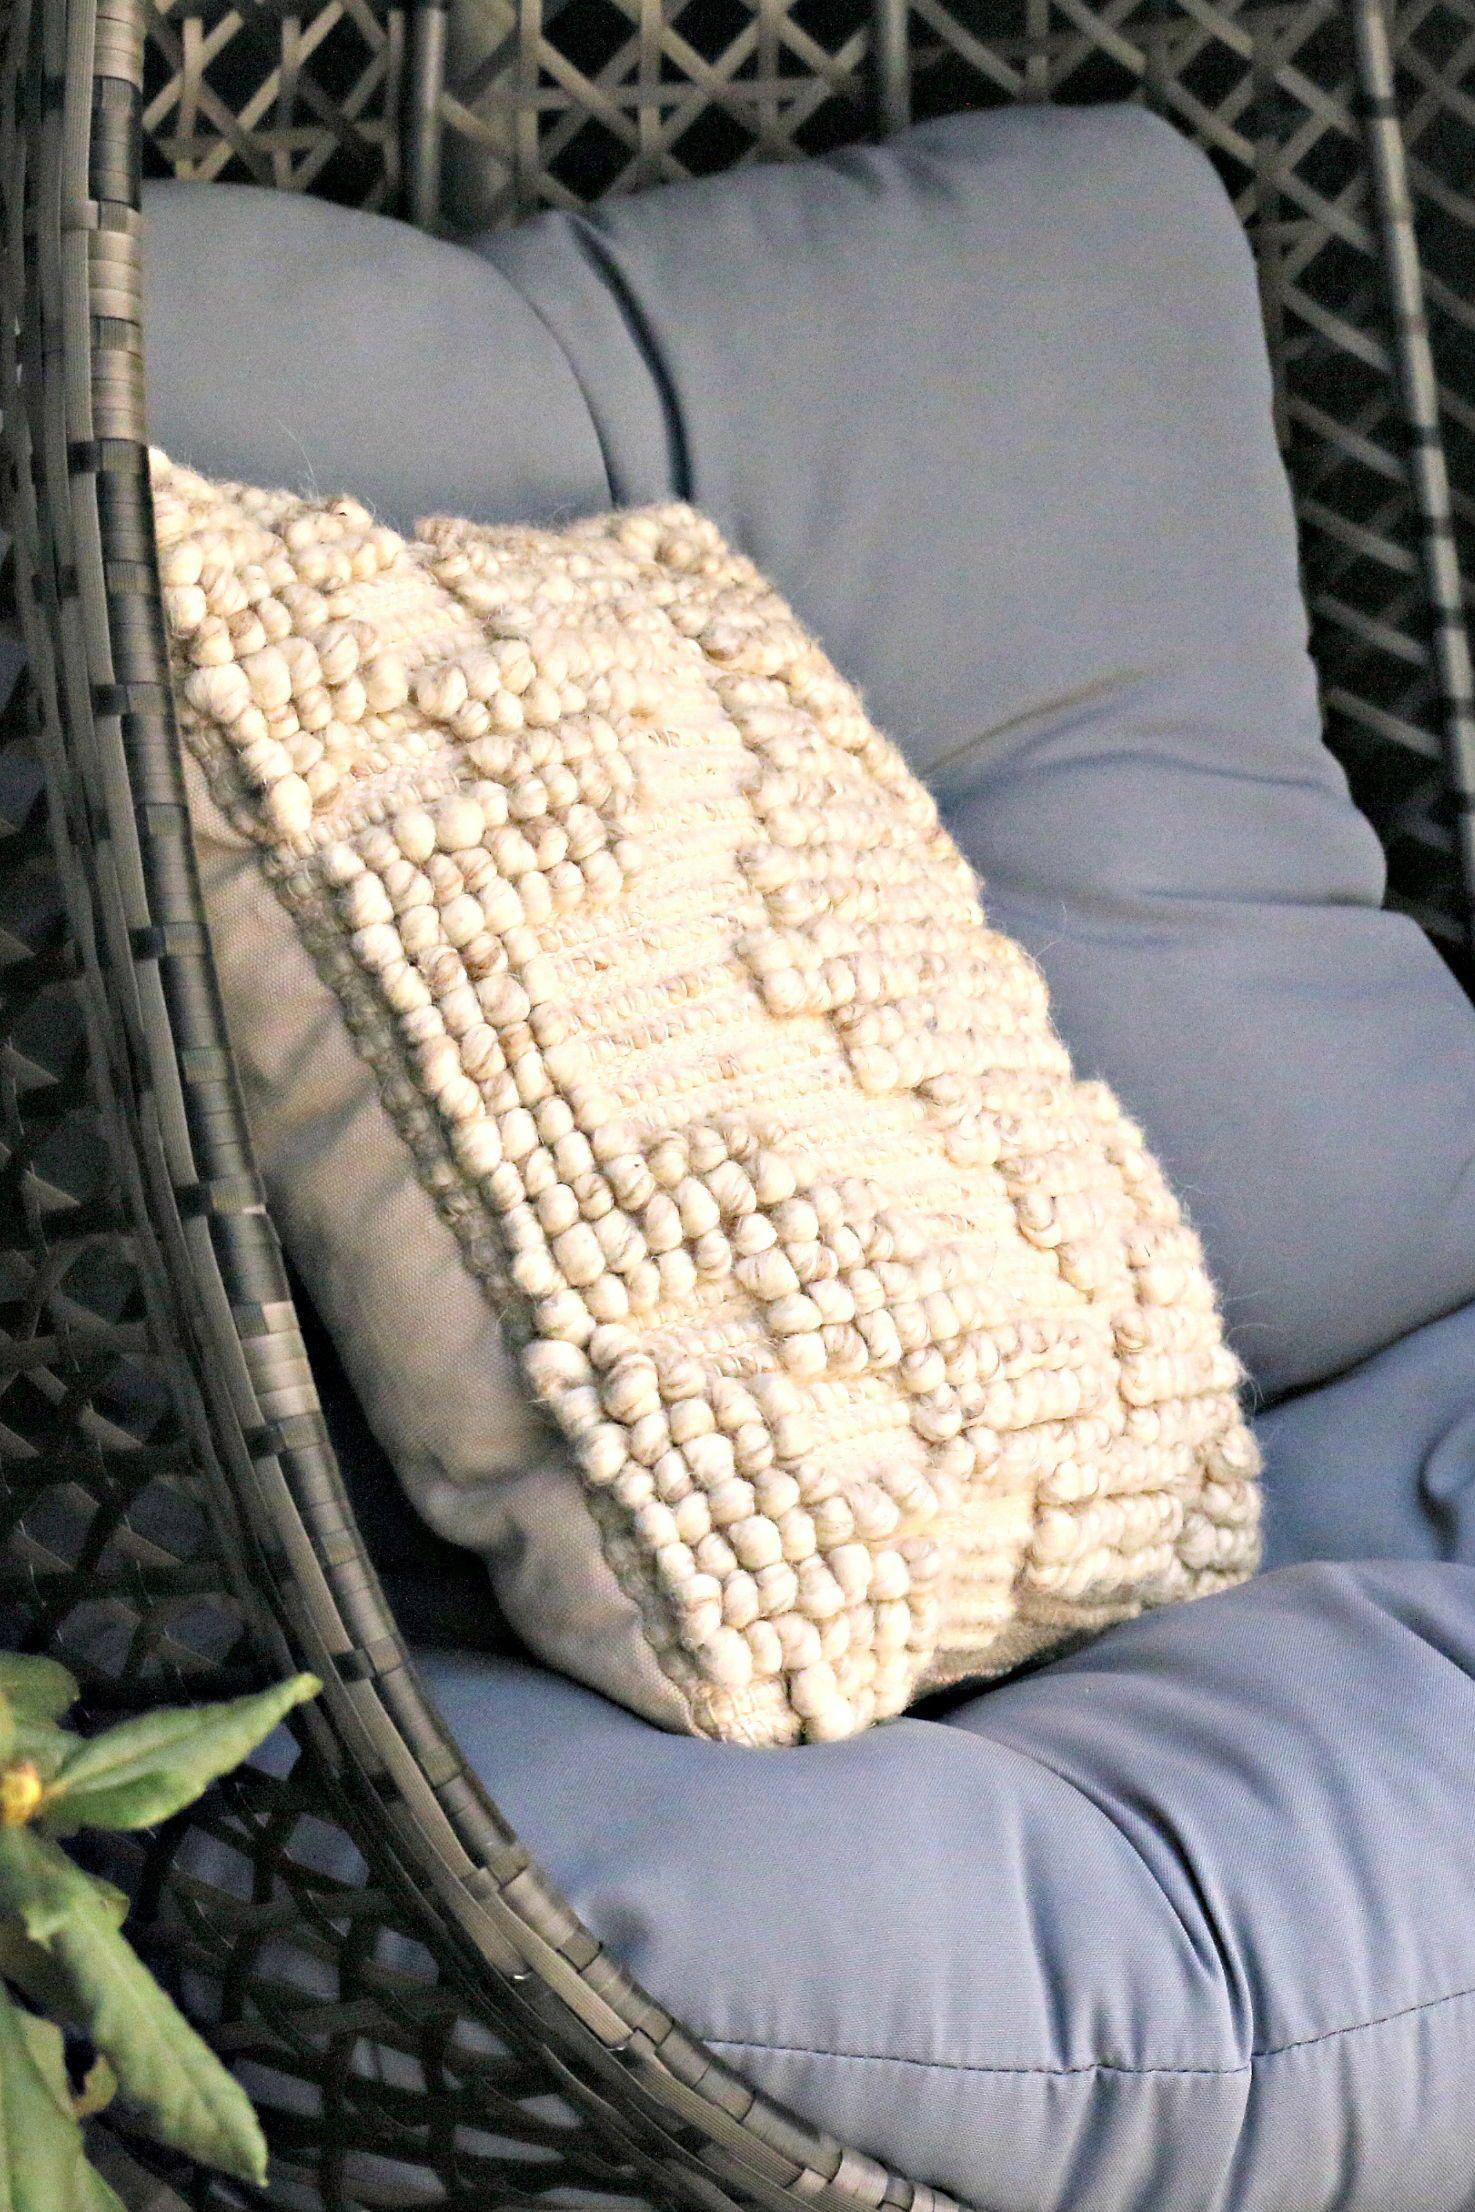 2e1b2d04b7a667634f0a2a328cfe238f - Better Homes And Gardens Aztec Cream Decorative Pillow